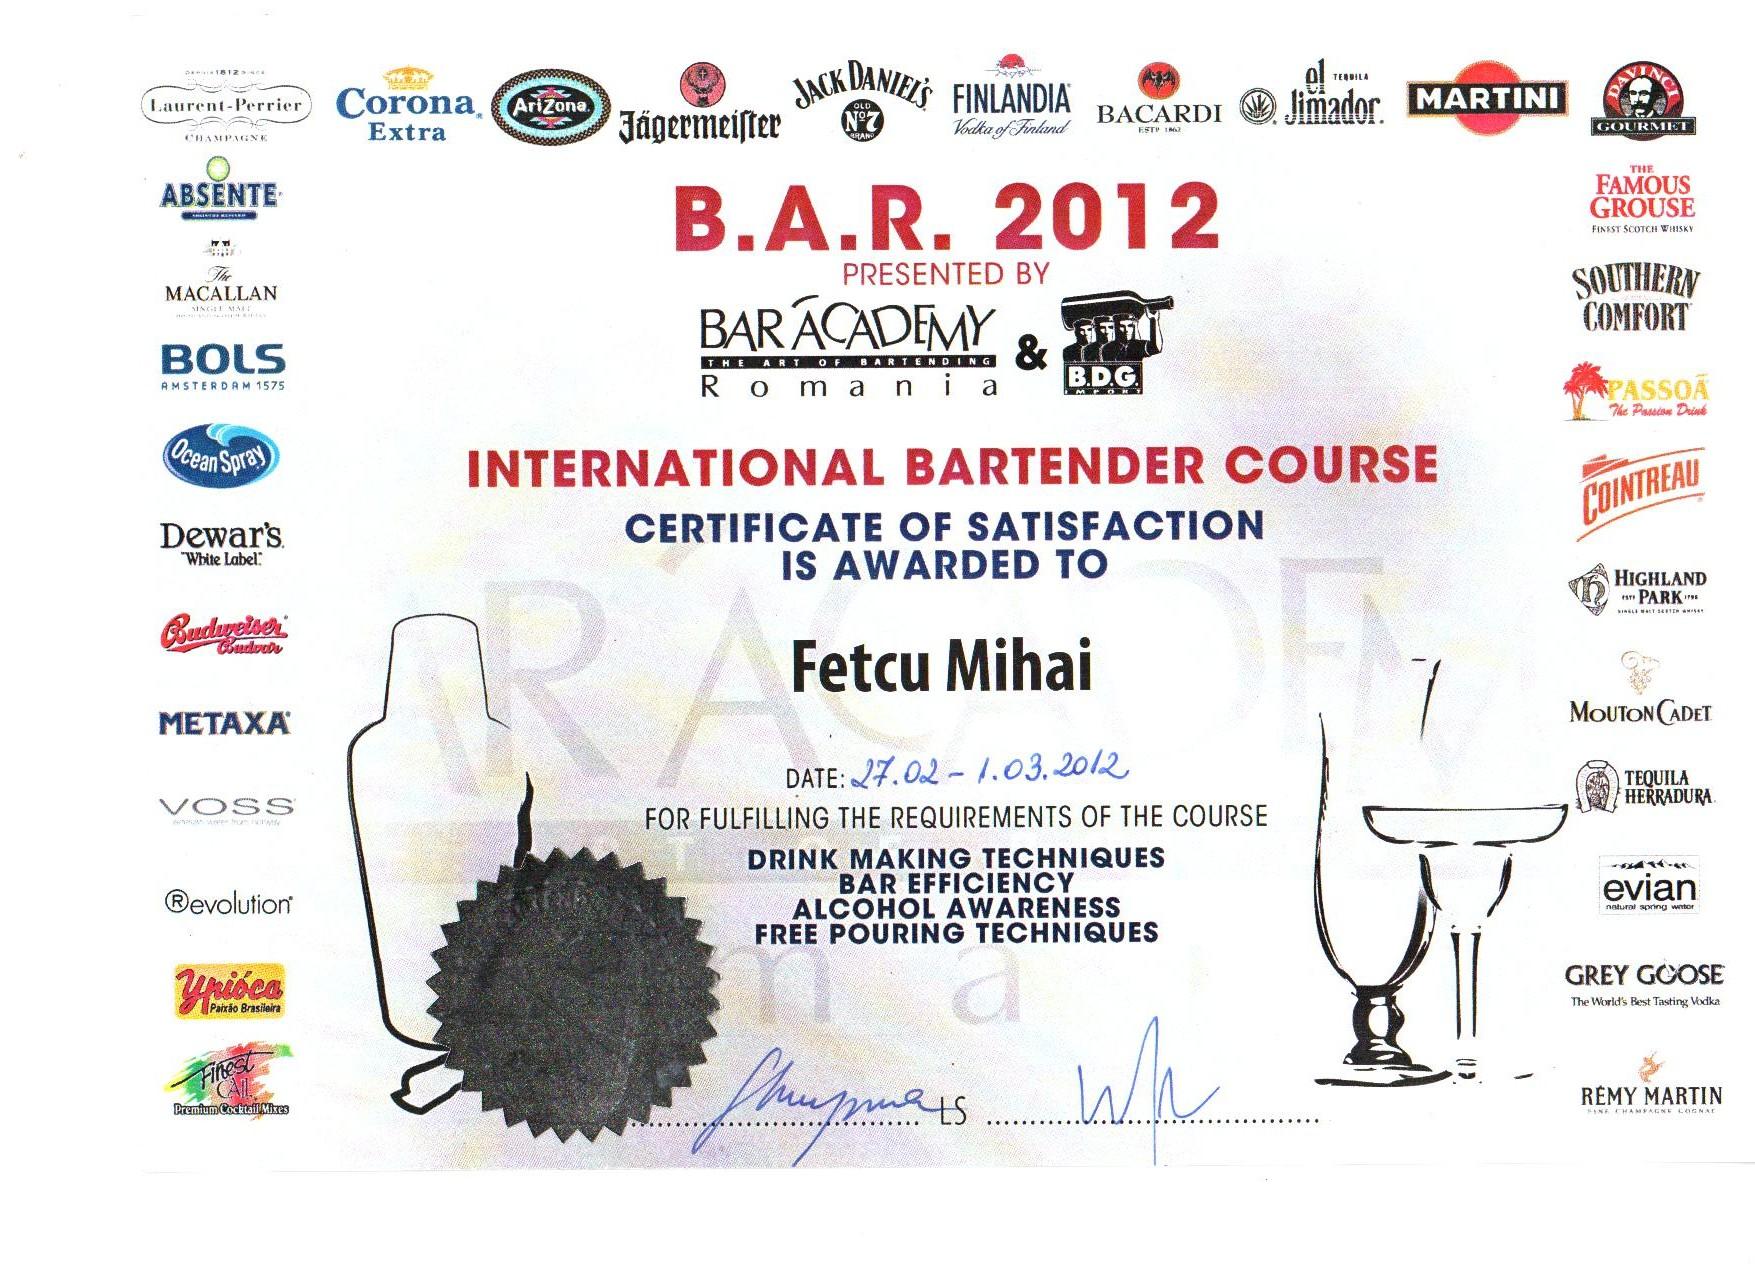 K_certificat bartender course 01.03.12